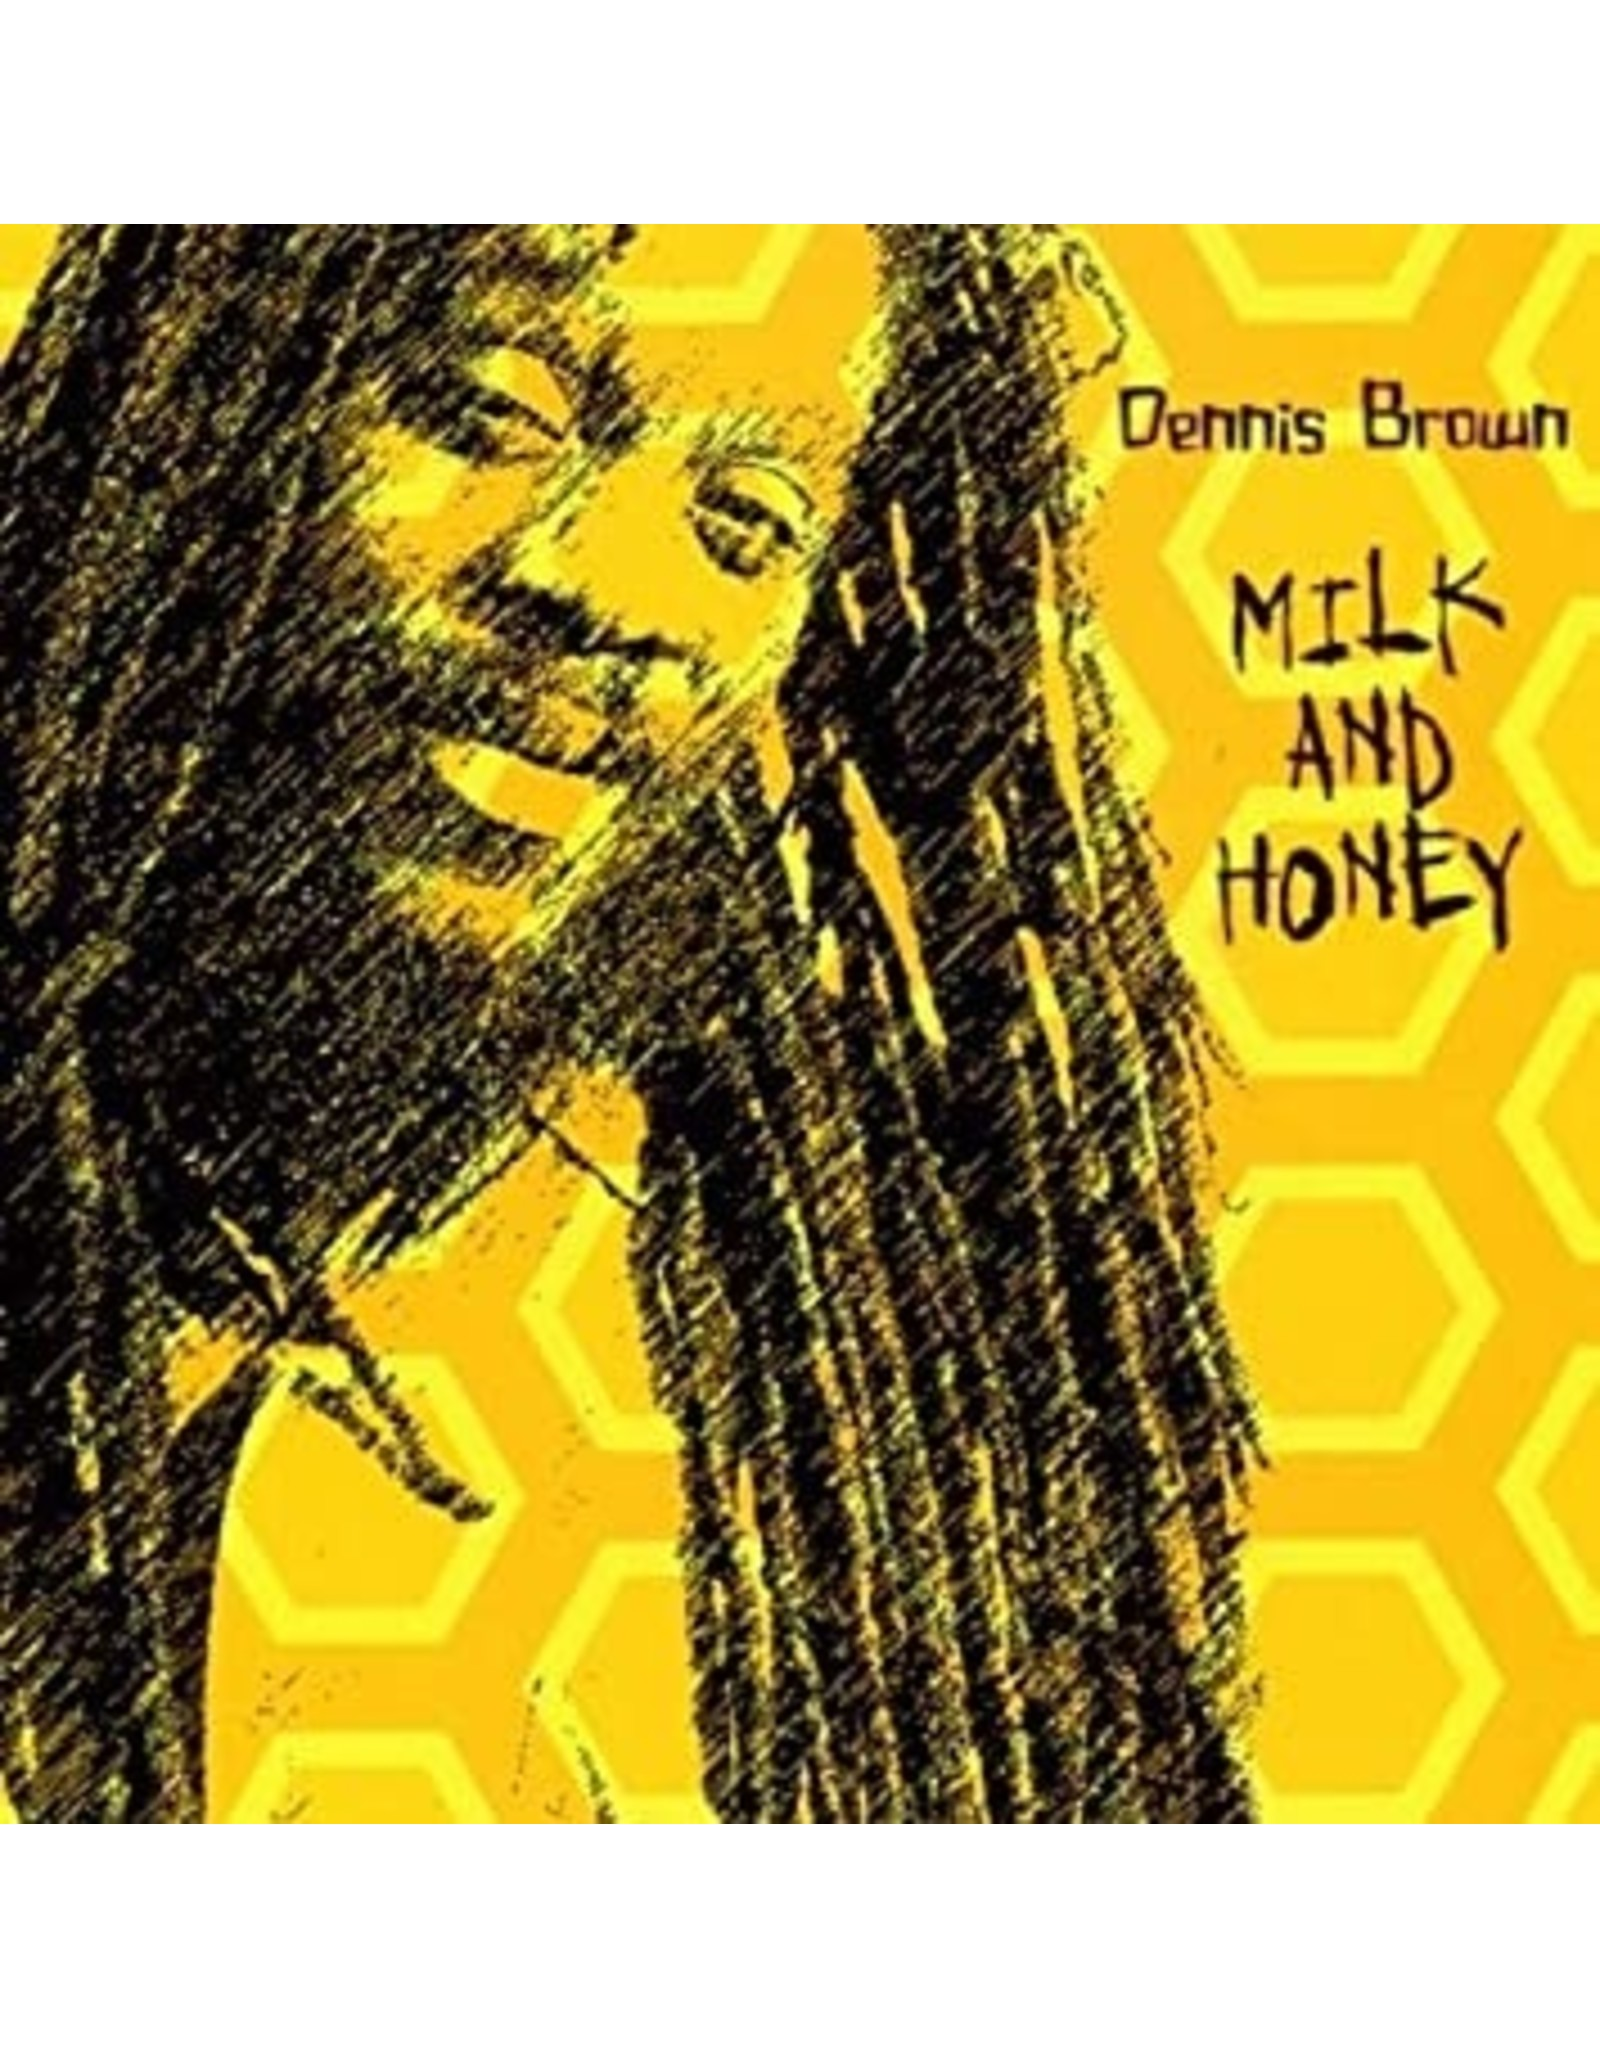 New Vinyl Dennis Brown - Milk & Honey LP